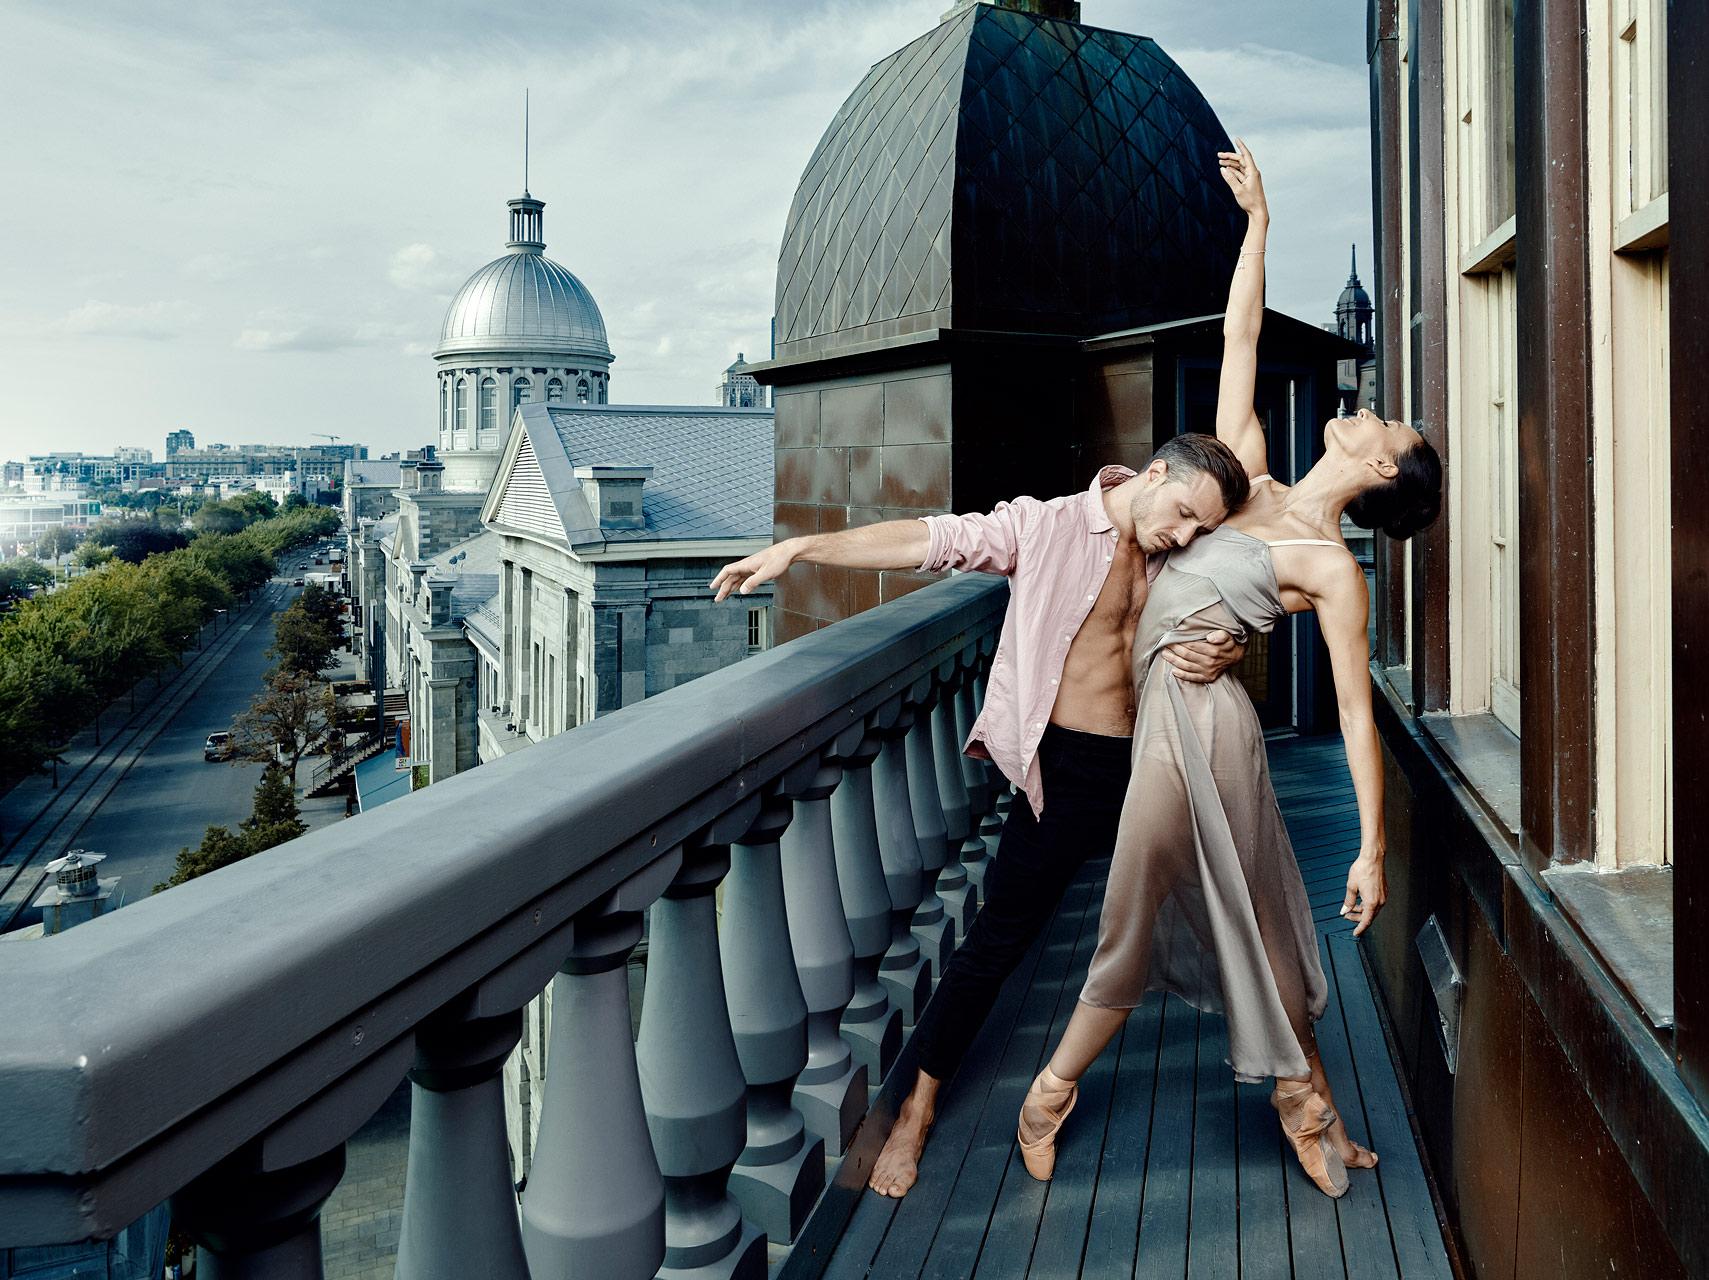 Dancers: Myriam Mechaiekh Simon & Jeremy C.Rai